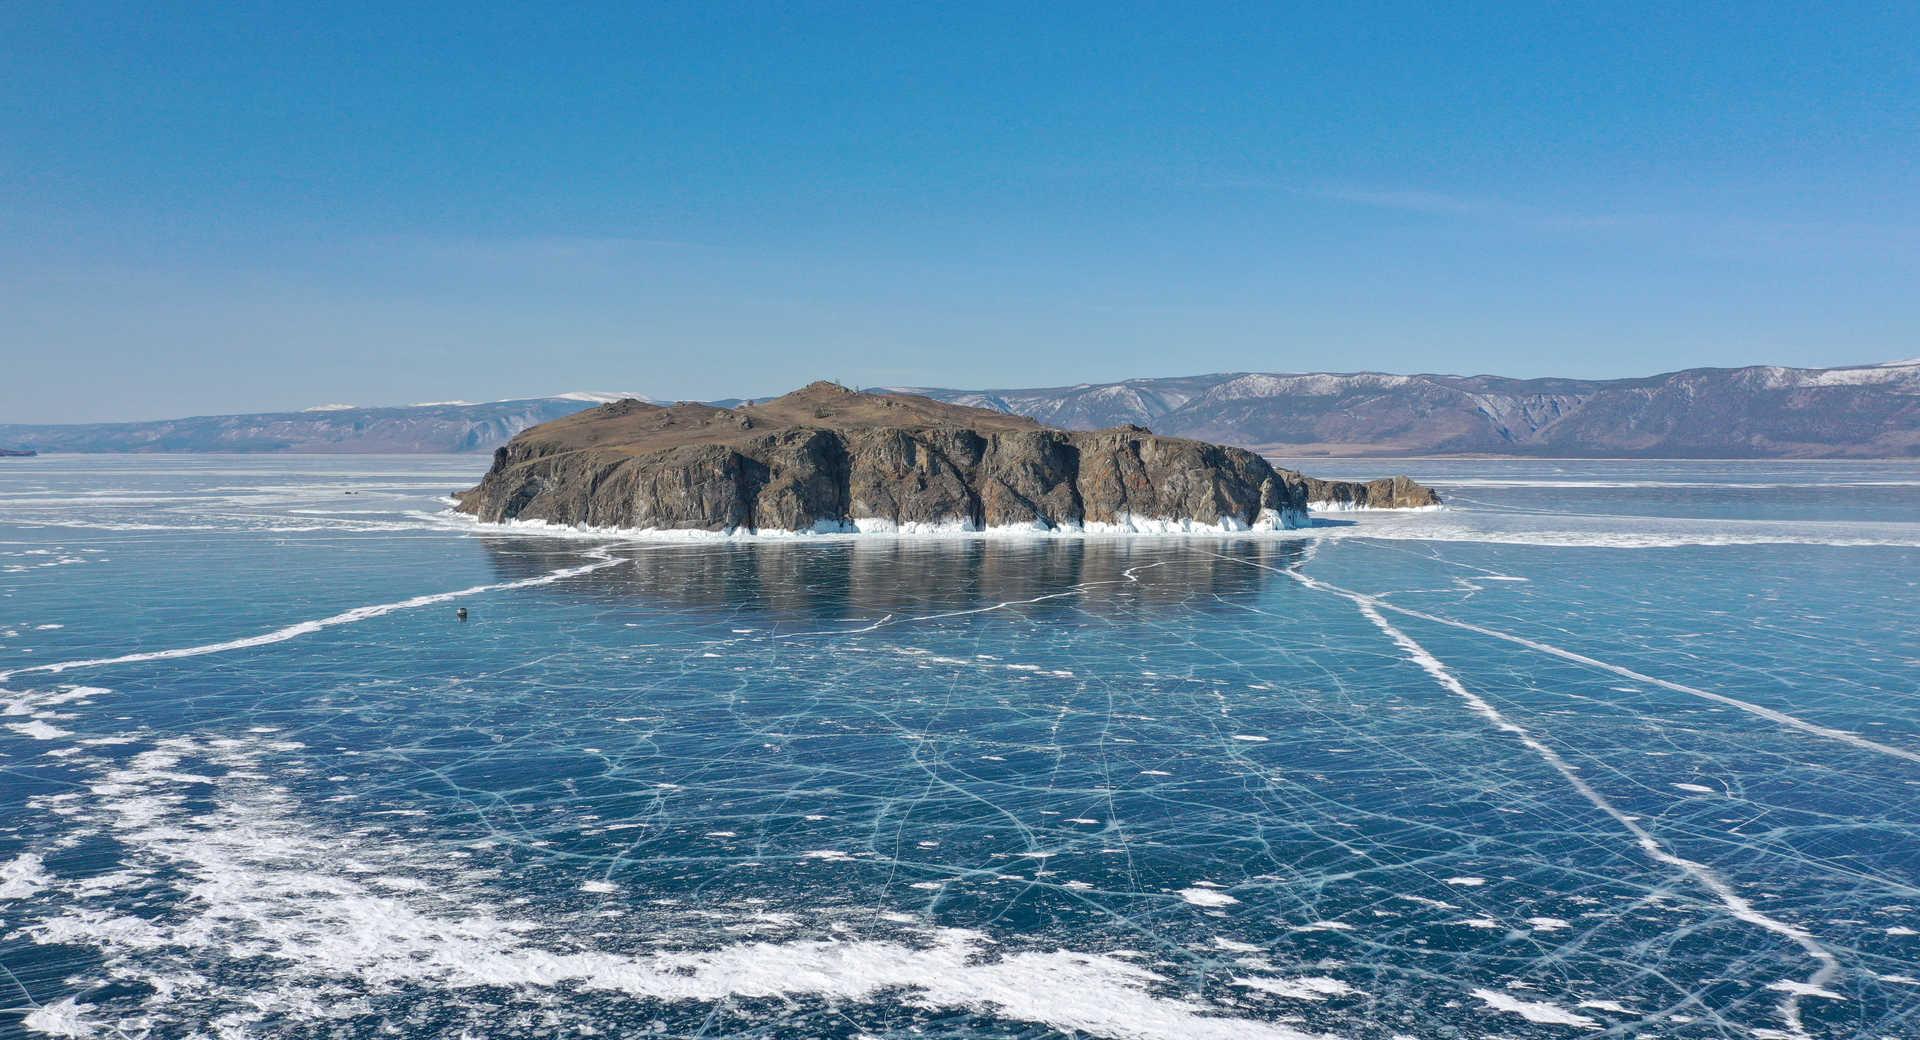 Voyage au Lac Baikal au printemps